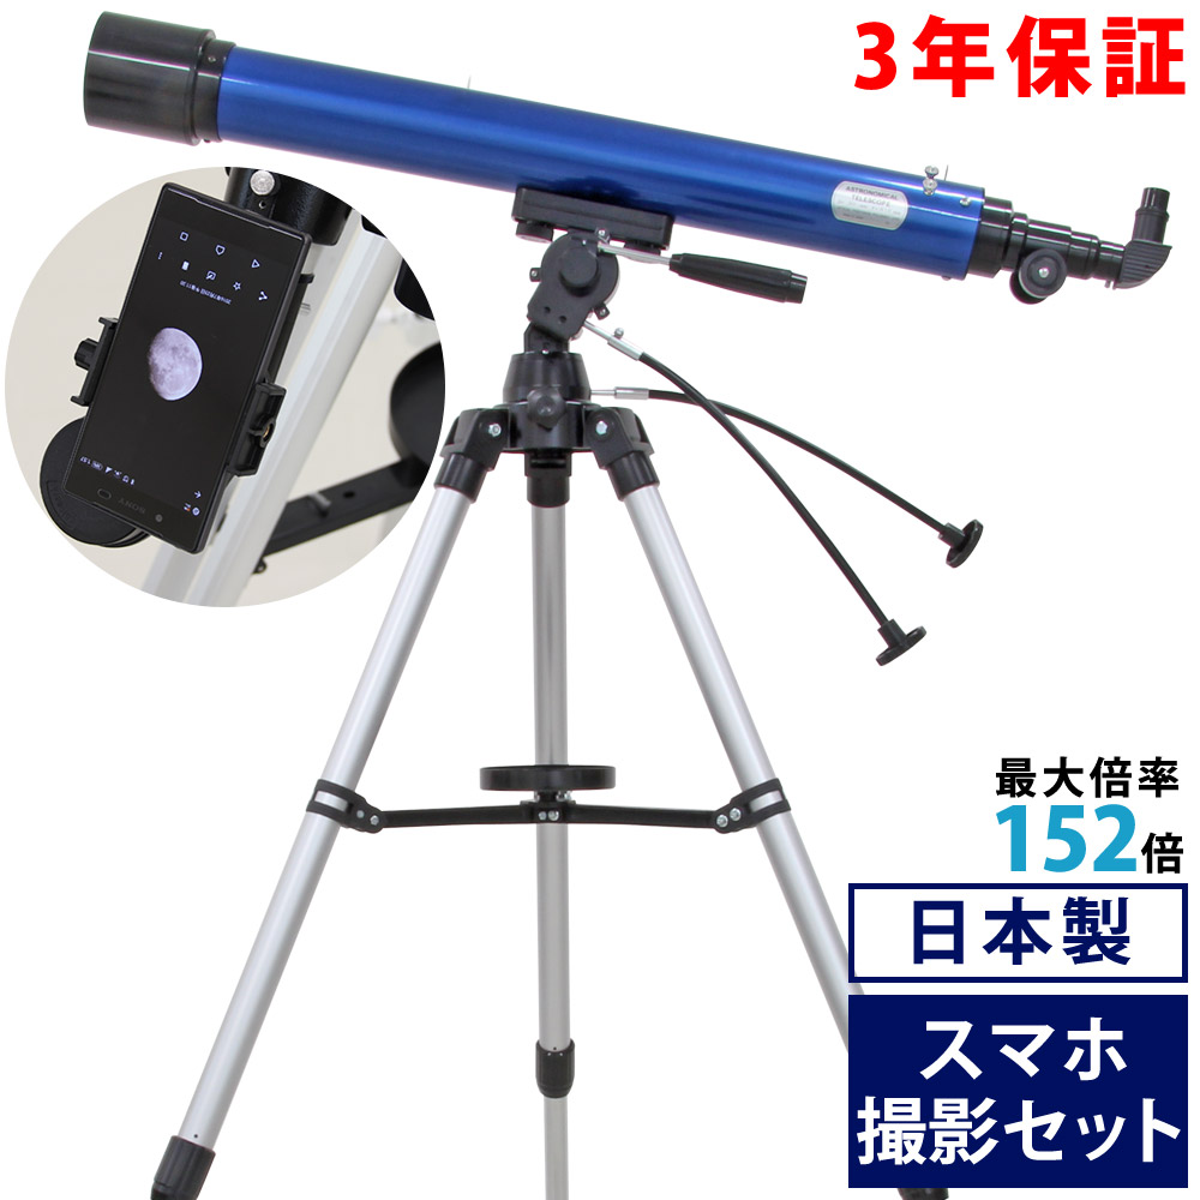 屈折式天体望遠鏡 リゲル80